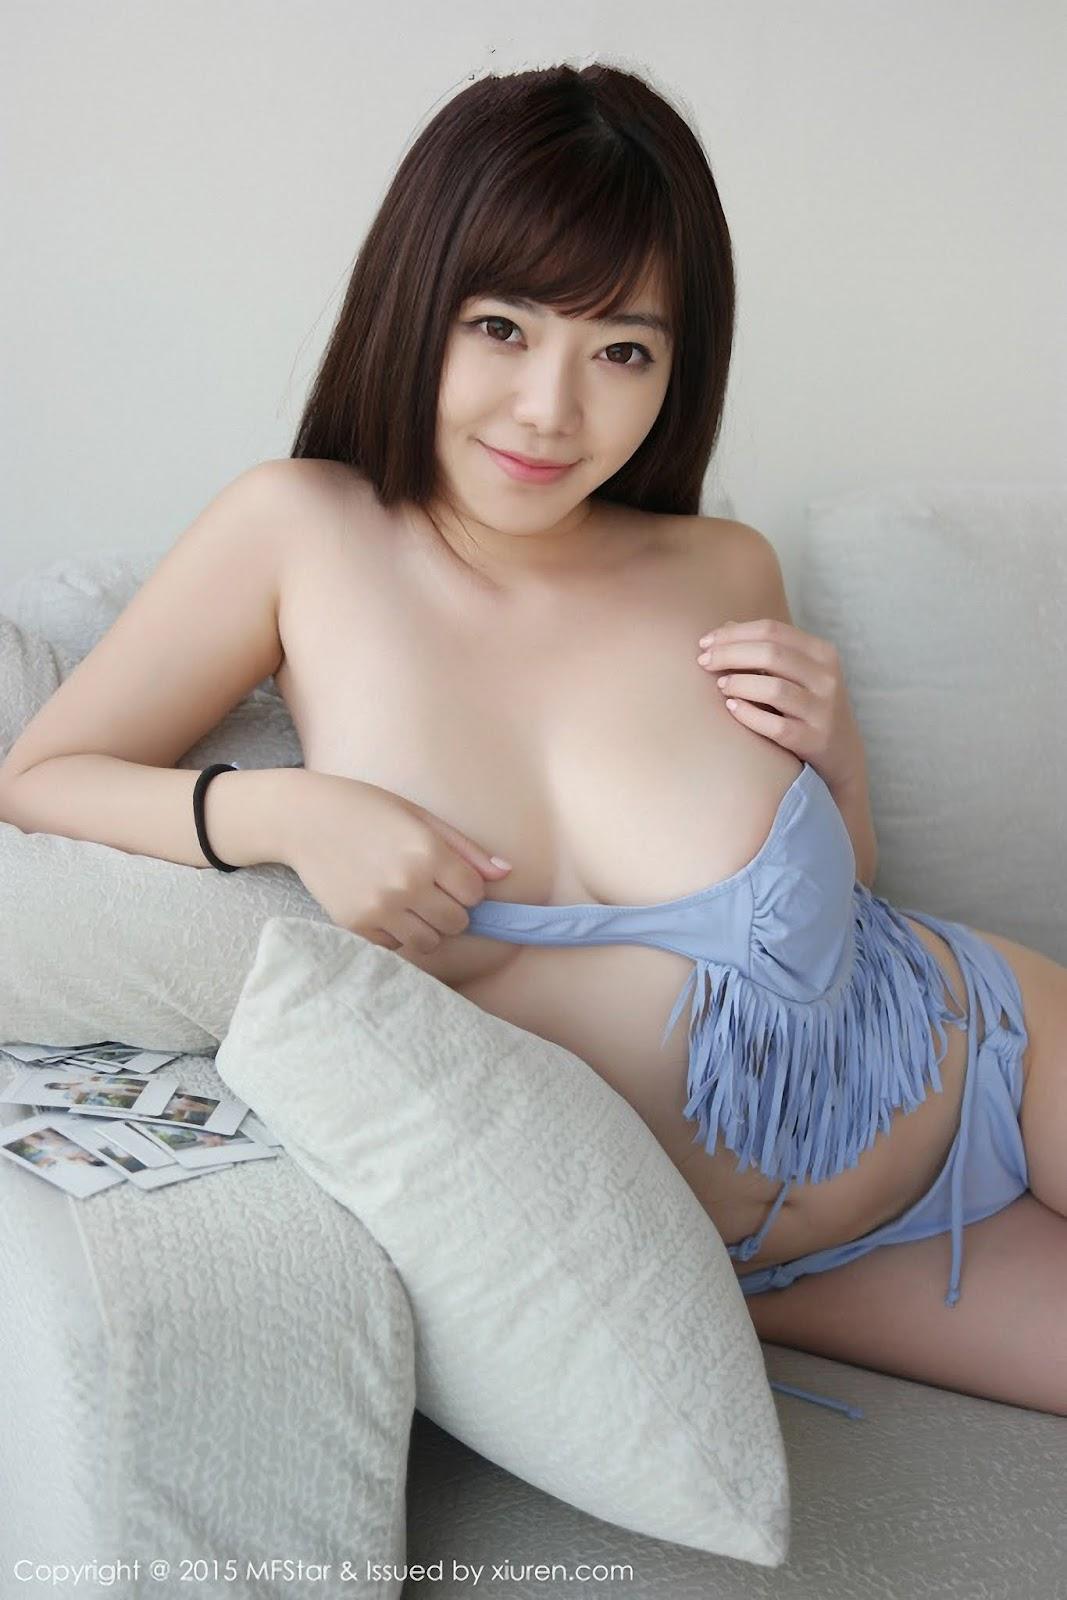 026 - MFSTAR VOL.3 FAYE Hot Nude Girl